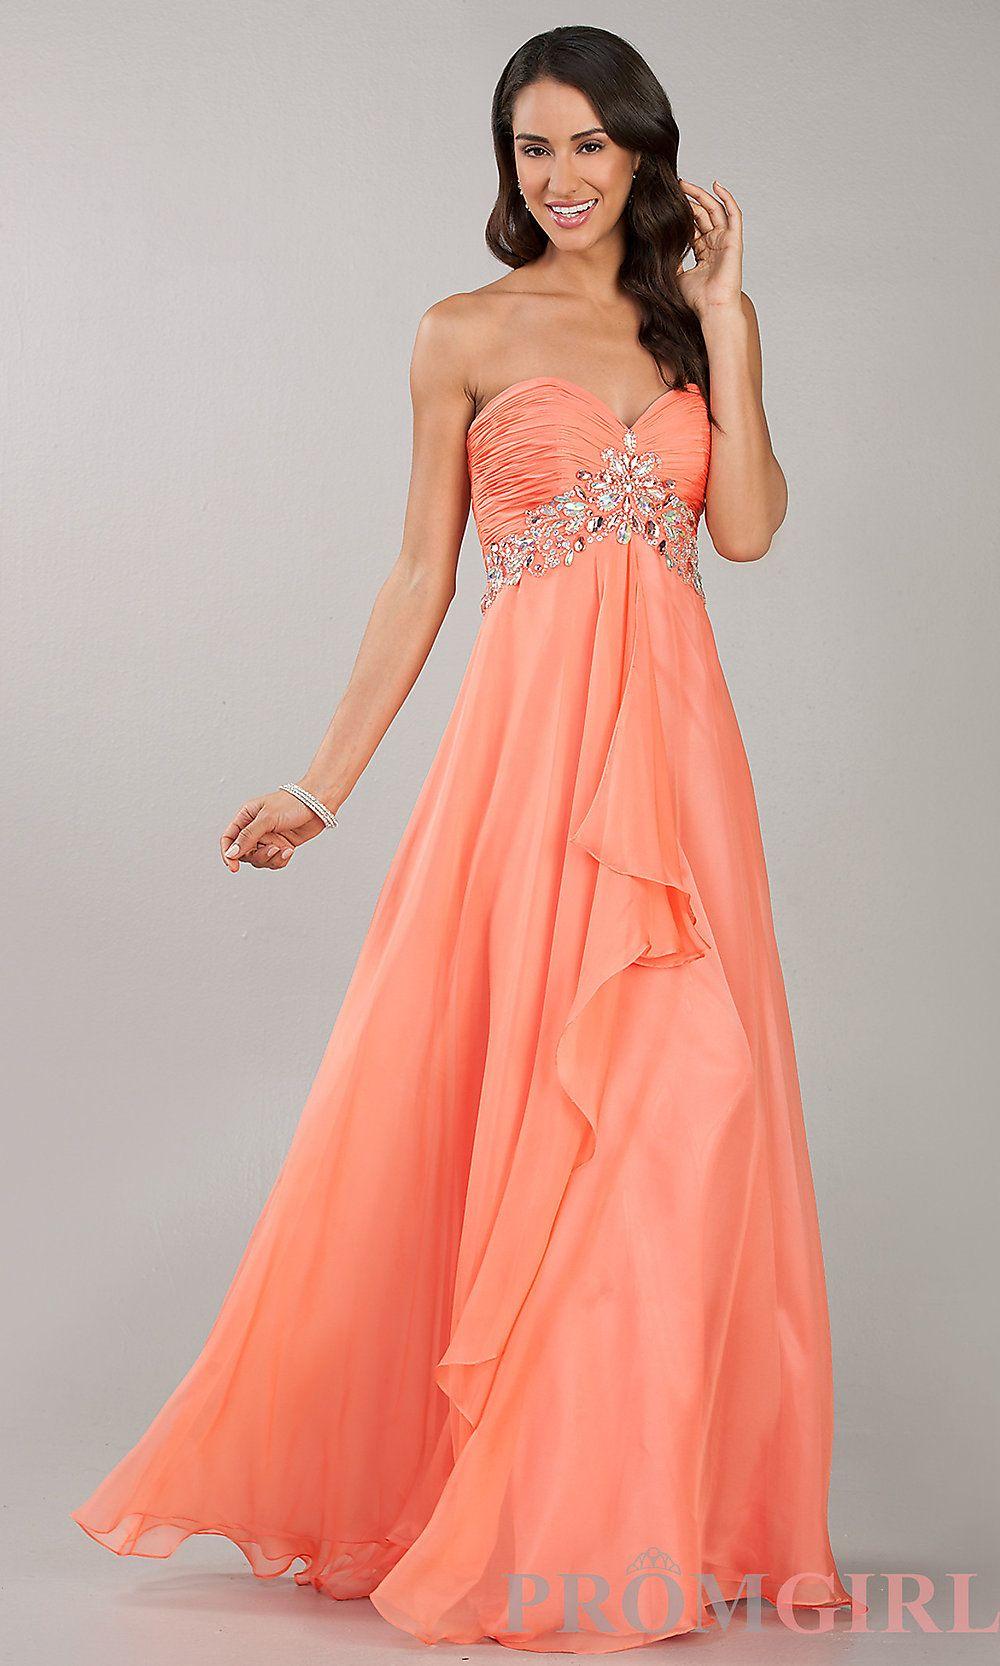 salmon colored formal dress  601e0b83e6c7